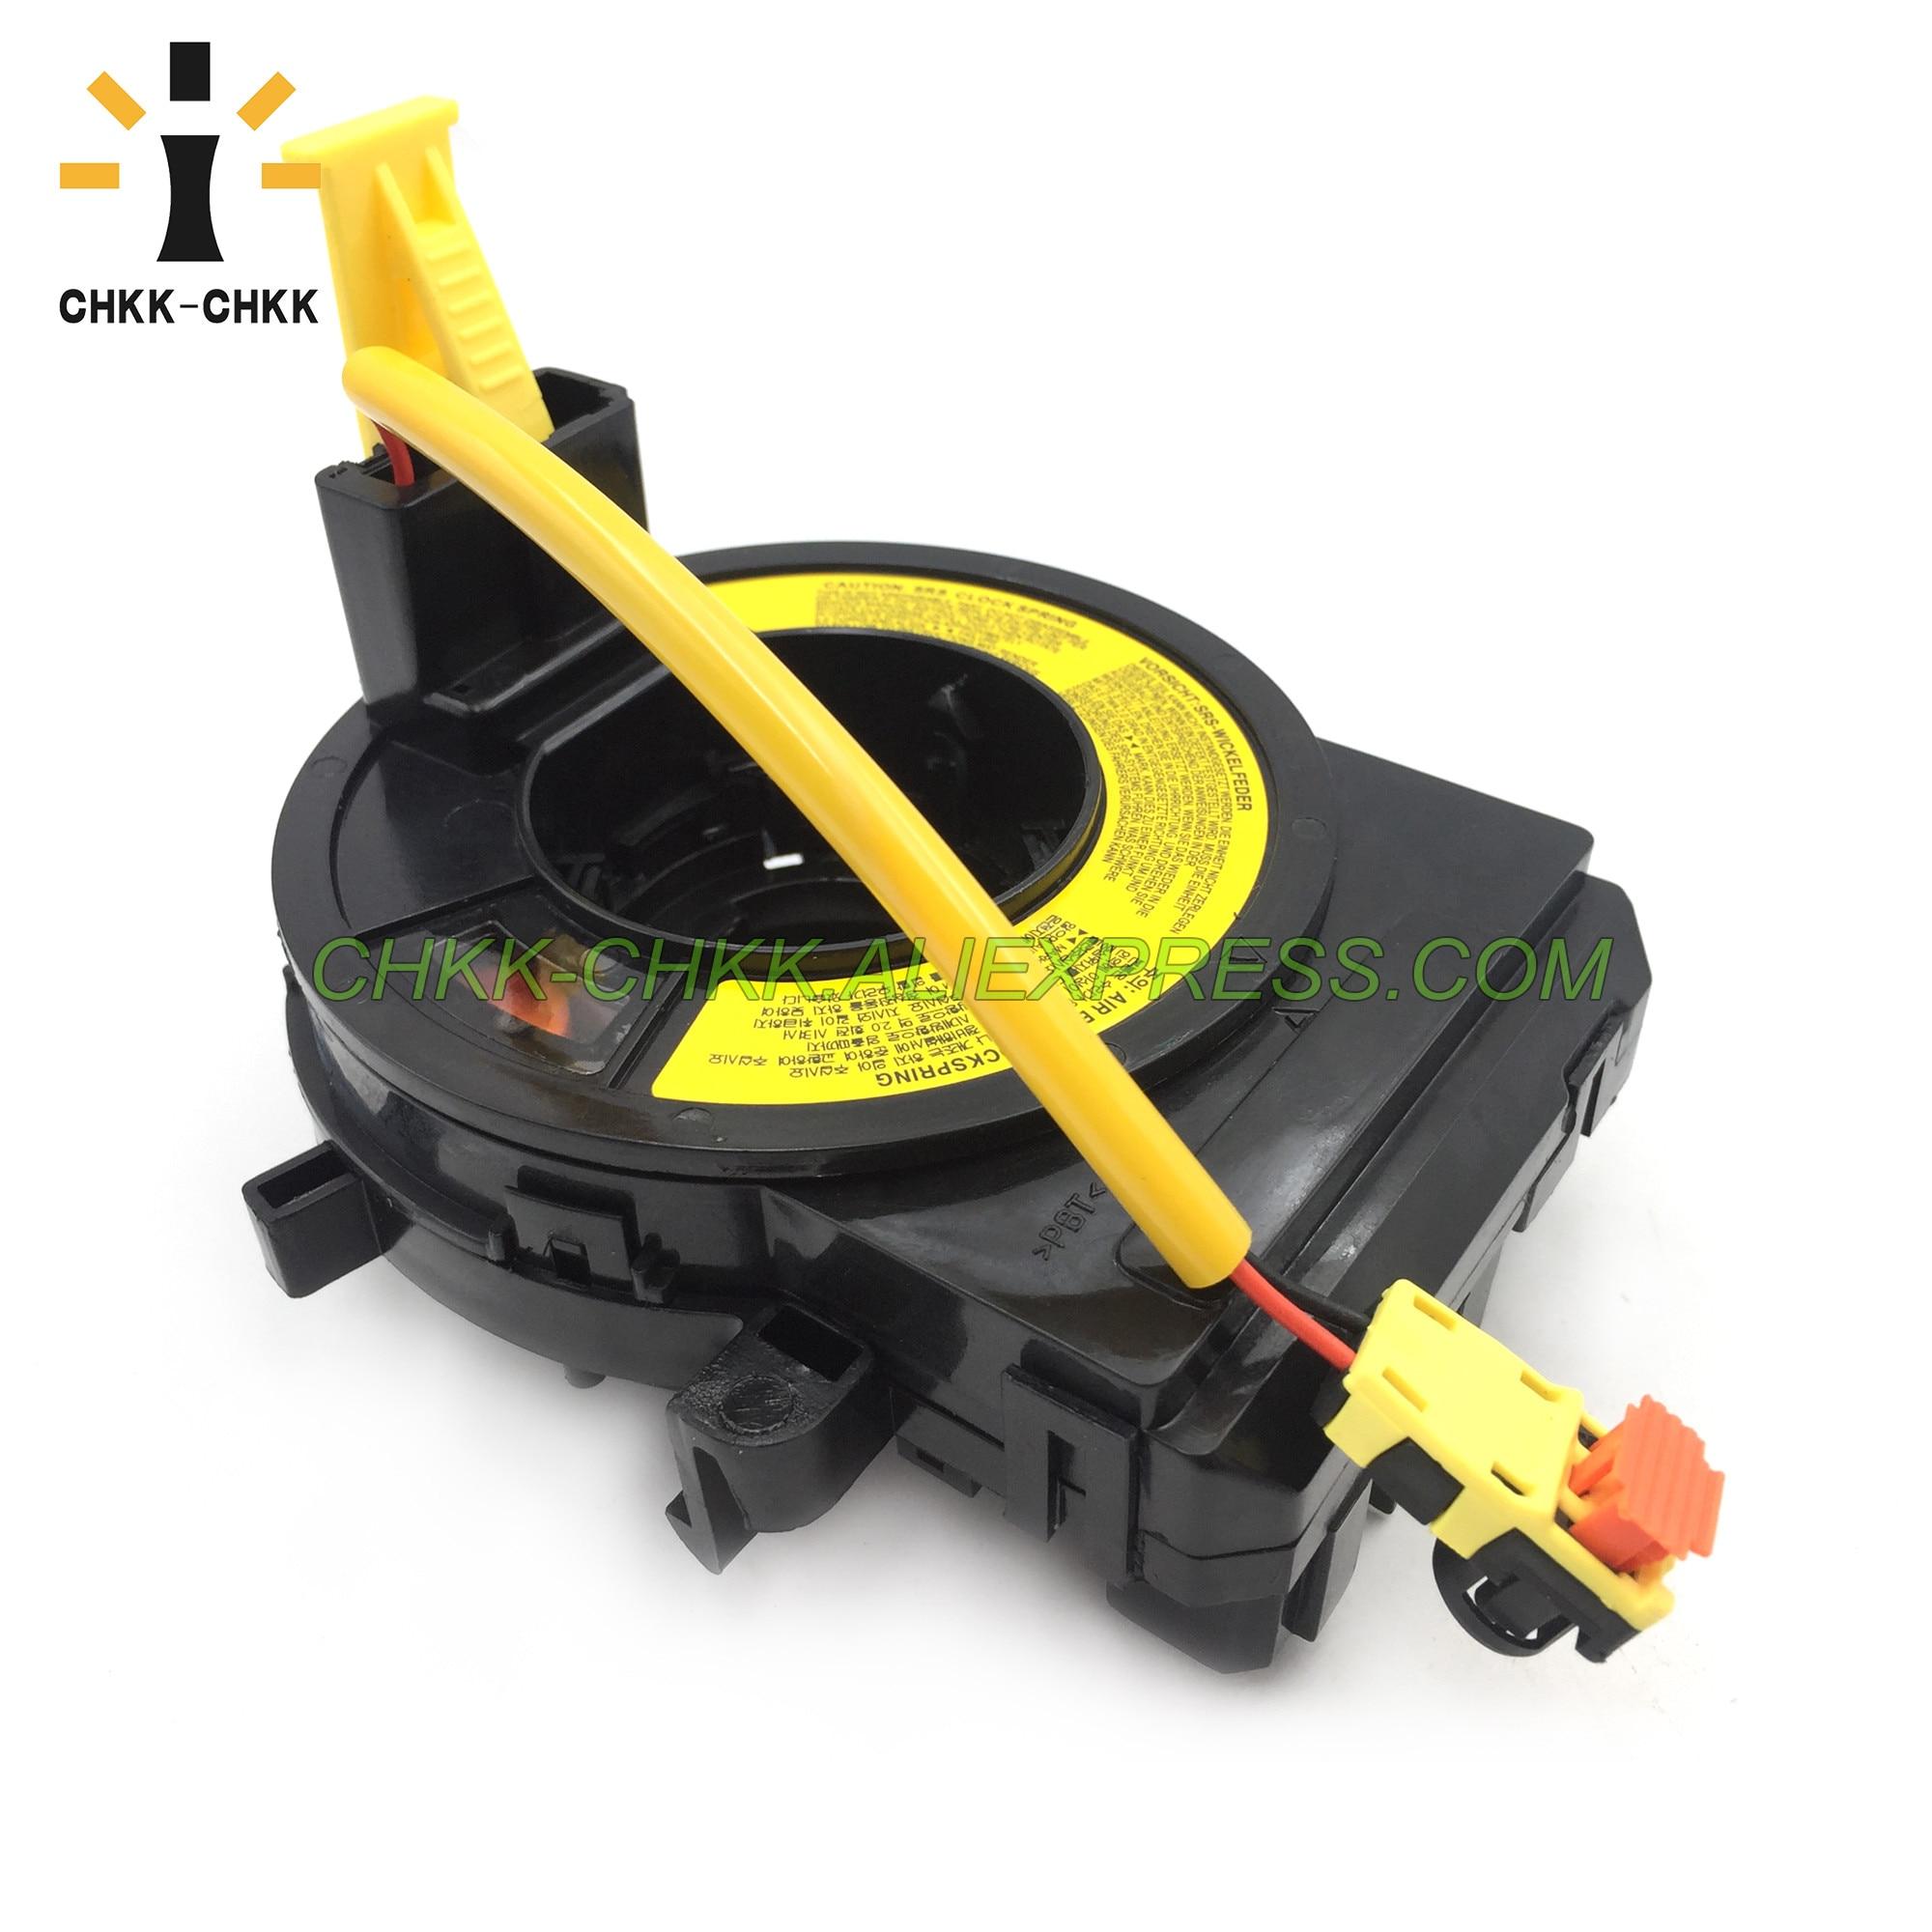 CHKK-CHKK nuevo 93490-1R410 para HYUNDAI ELANTRA K3 acento SOLARIS 2011-934901R410